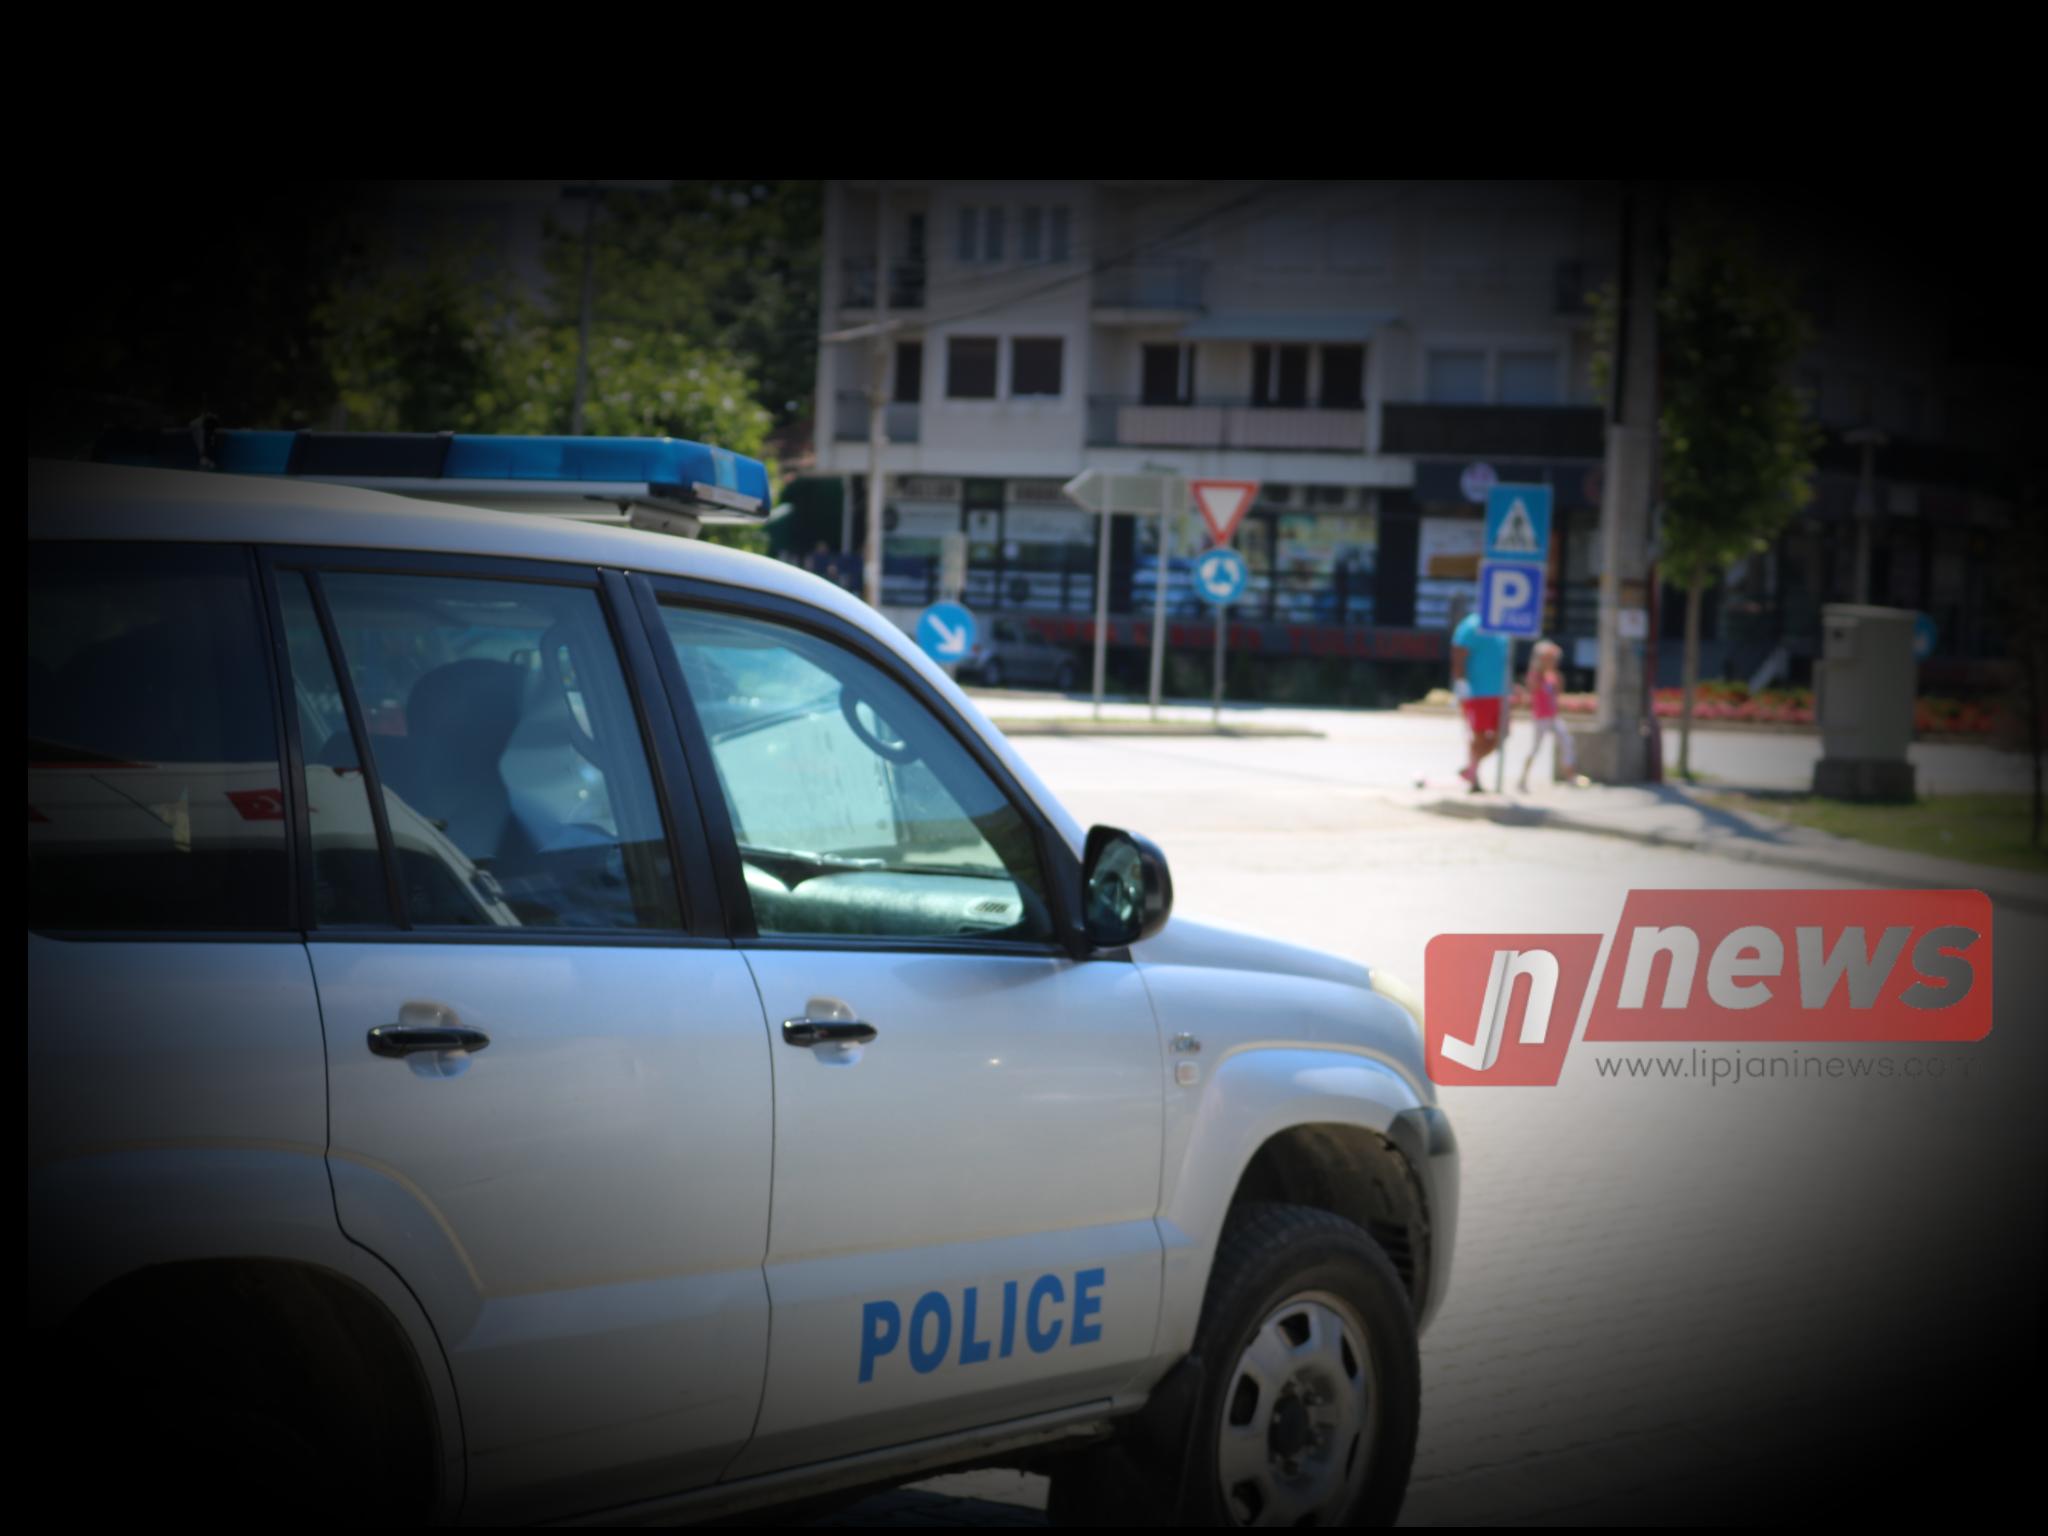 Arrestohen dy persona në Lipjan